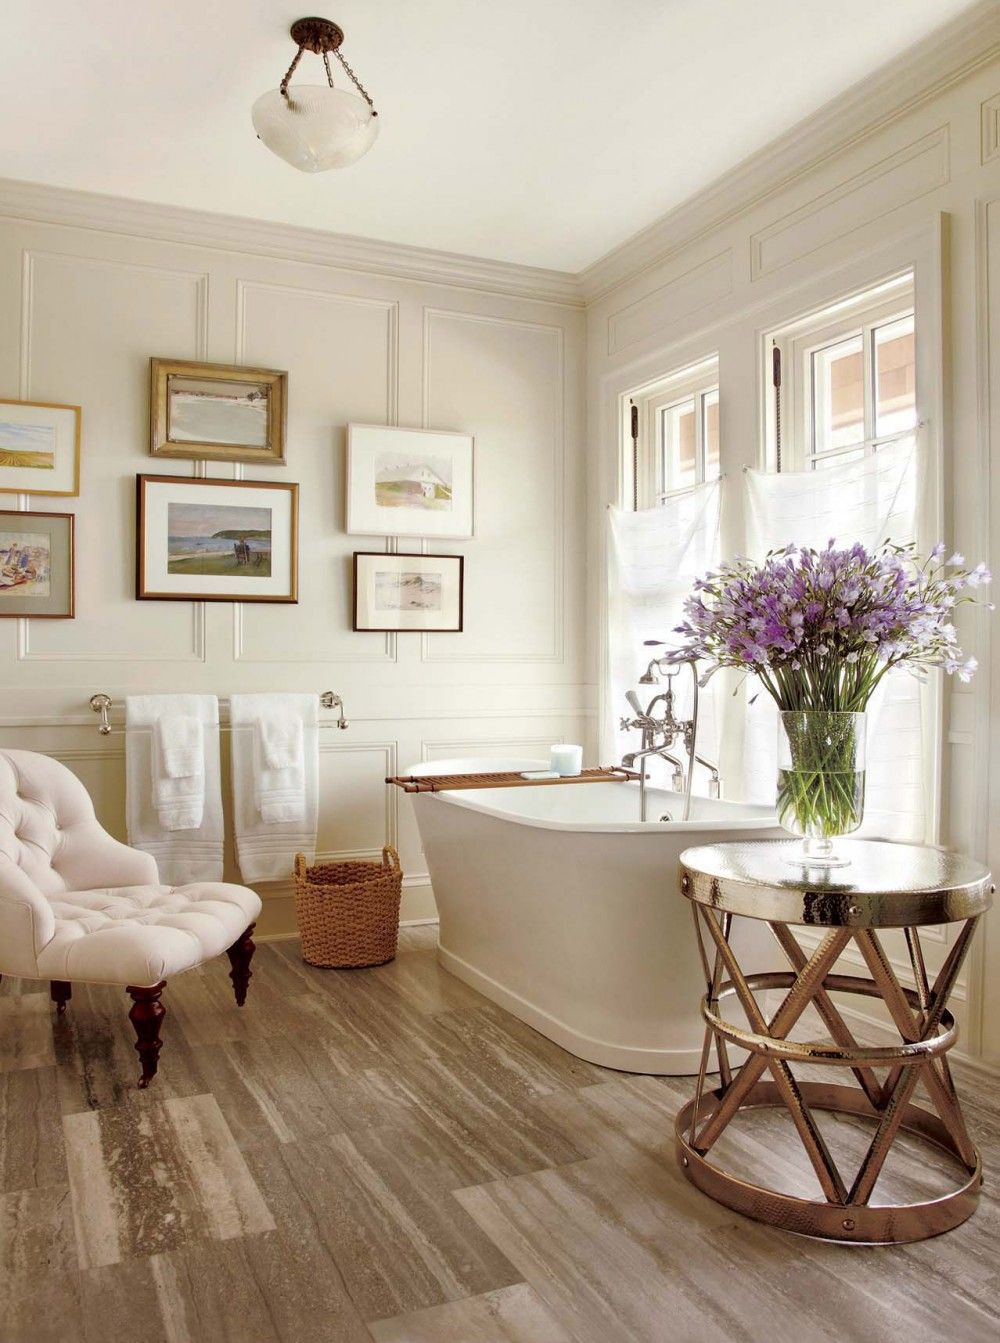 17 best images about bathroom - 8x8 ideas on pinterest | color